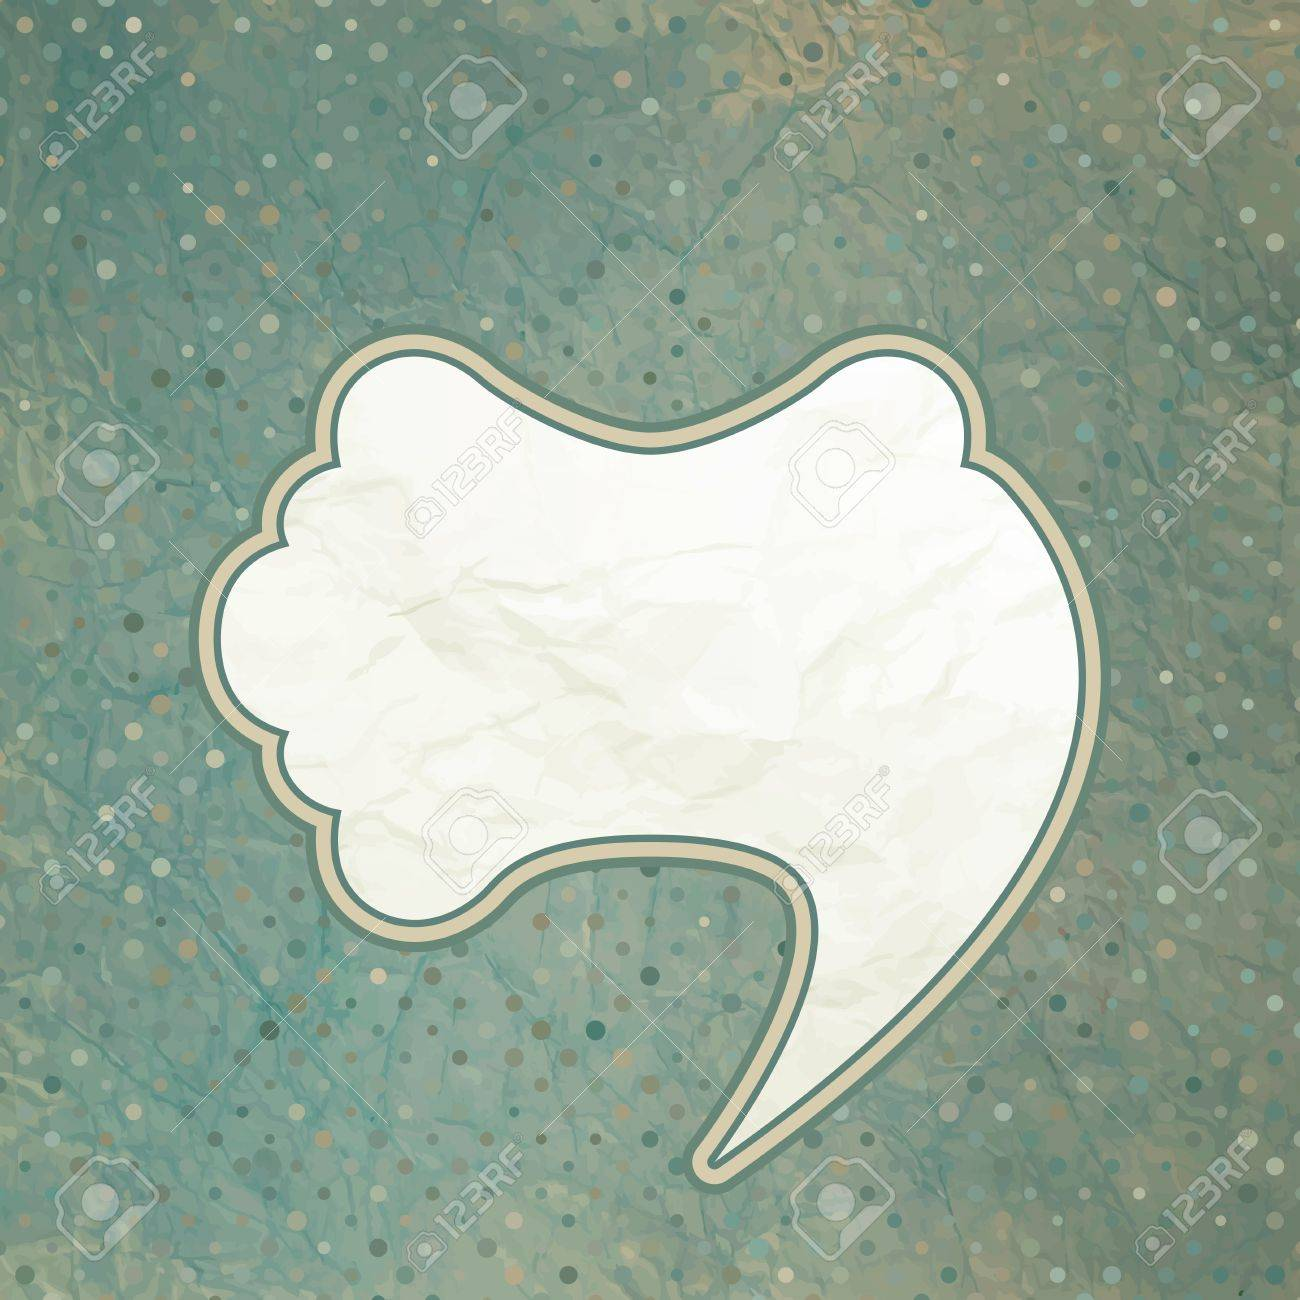 Vintage speech bubble design  EPS 8 Stock Vector - 13376186